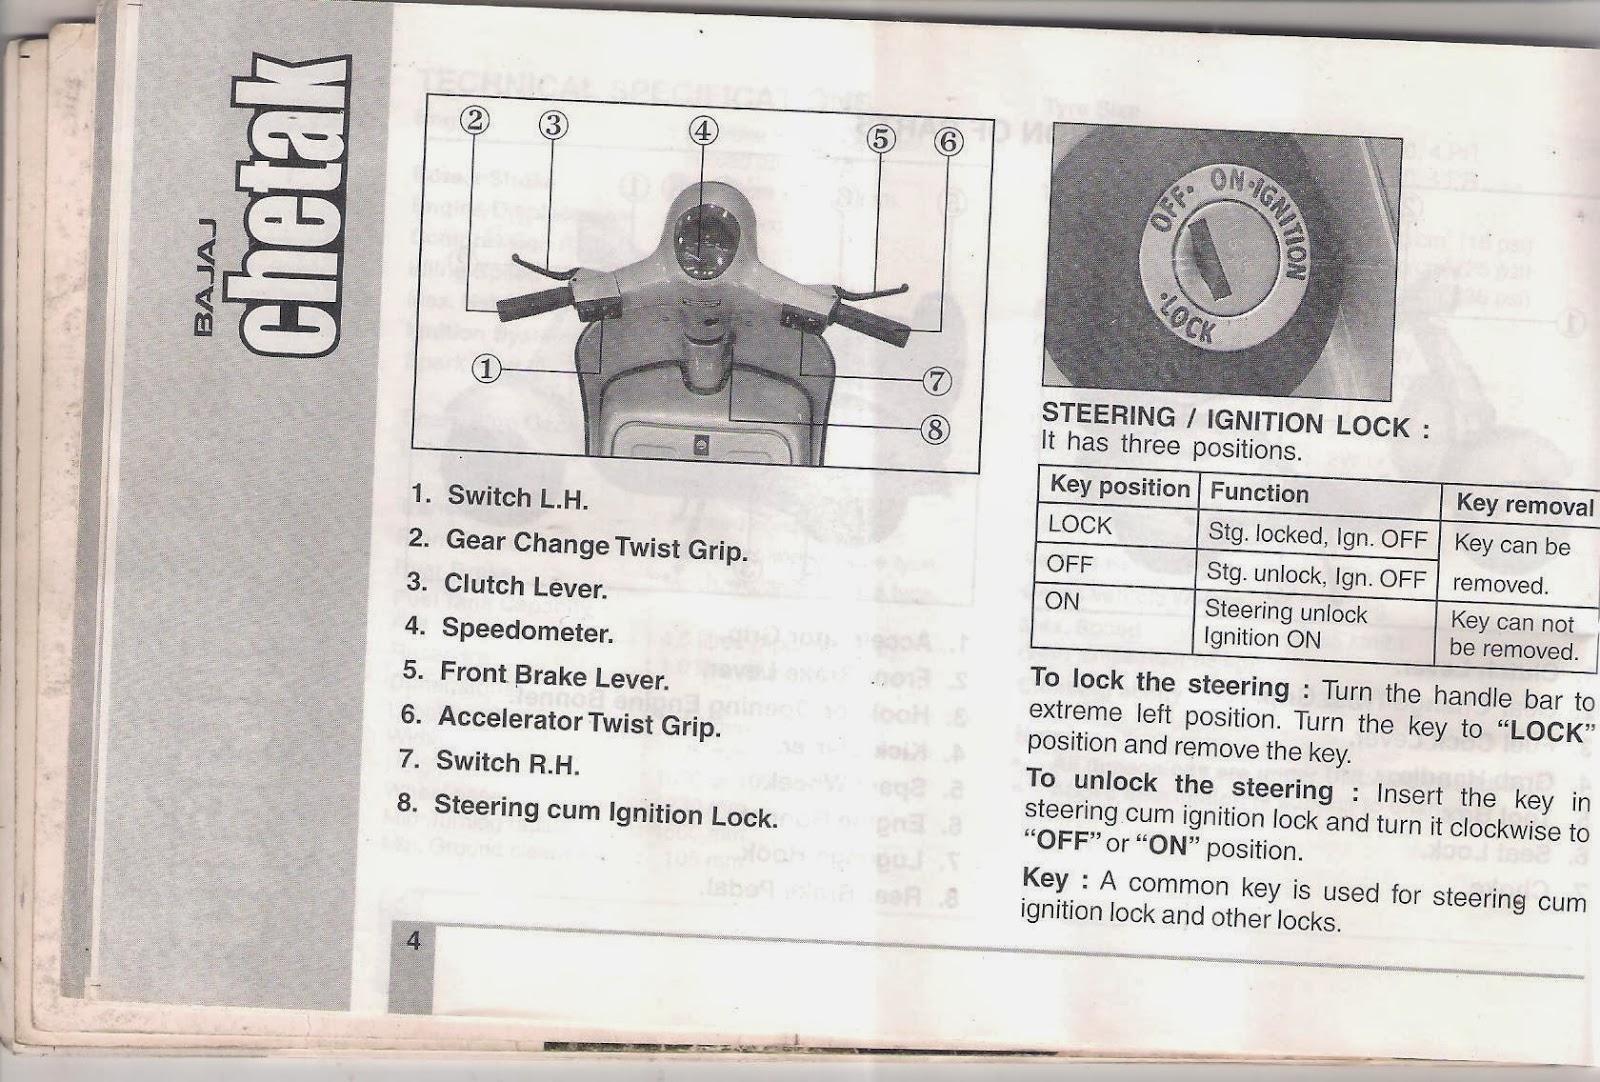 rare motorcycle bajaj chetak 2005 model owners manual rh oldraremotorcycles blogspot com bajaj chetak user manual bajaj chetak manual pdf